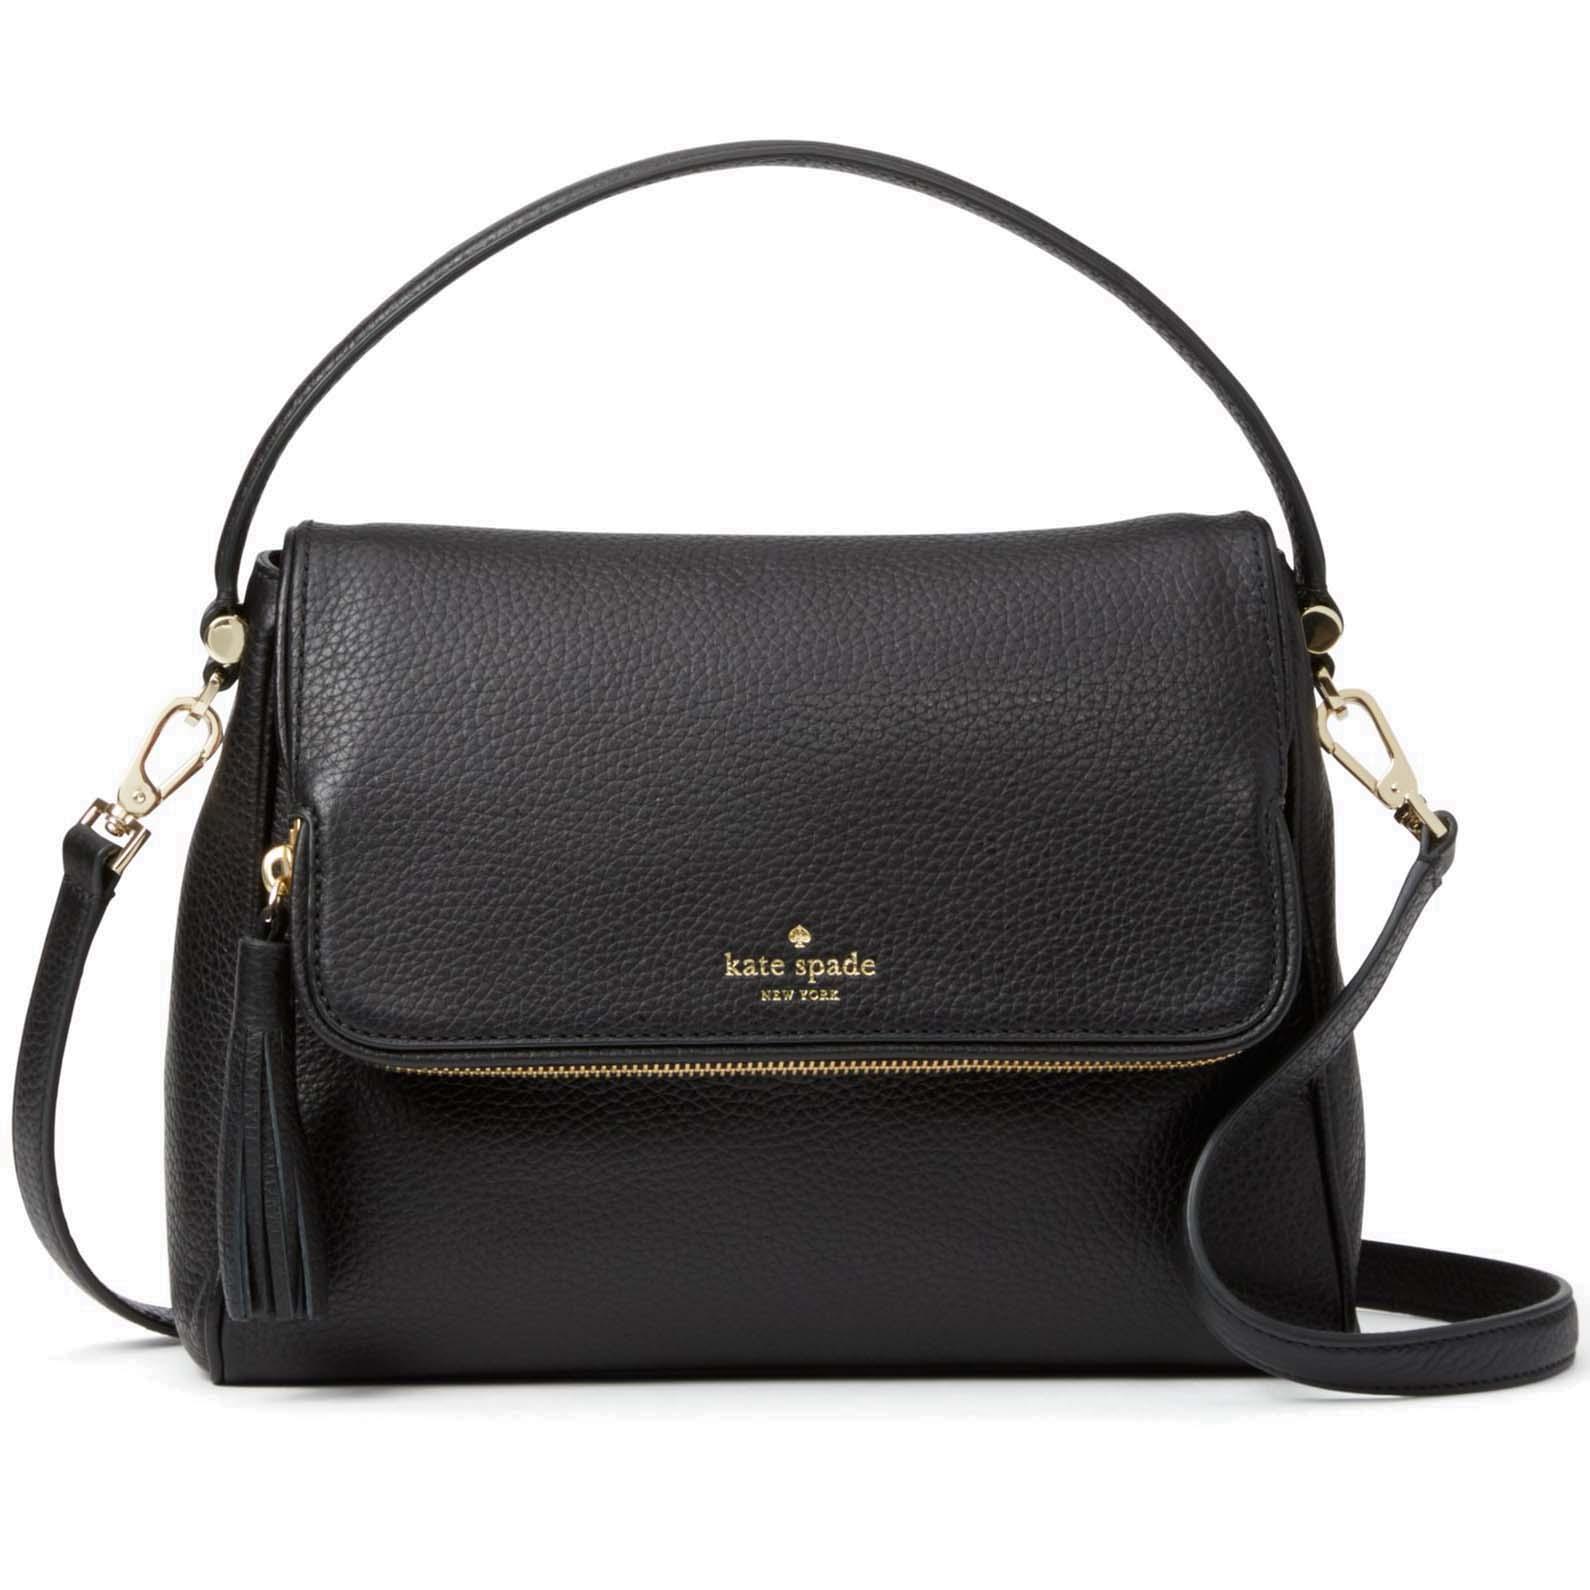 c1ff807f2fb52 Kate Spade Chester Street Miri Handbag Black   WKRU4076 + Gift Receipt